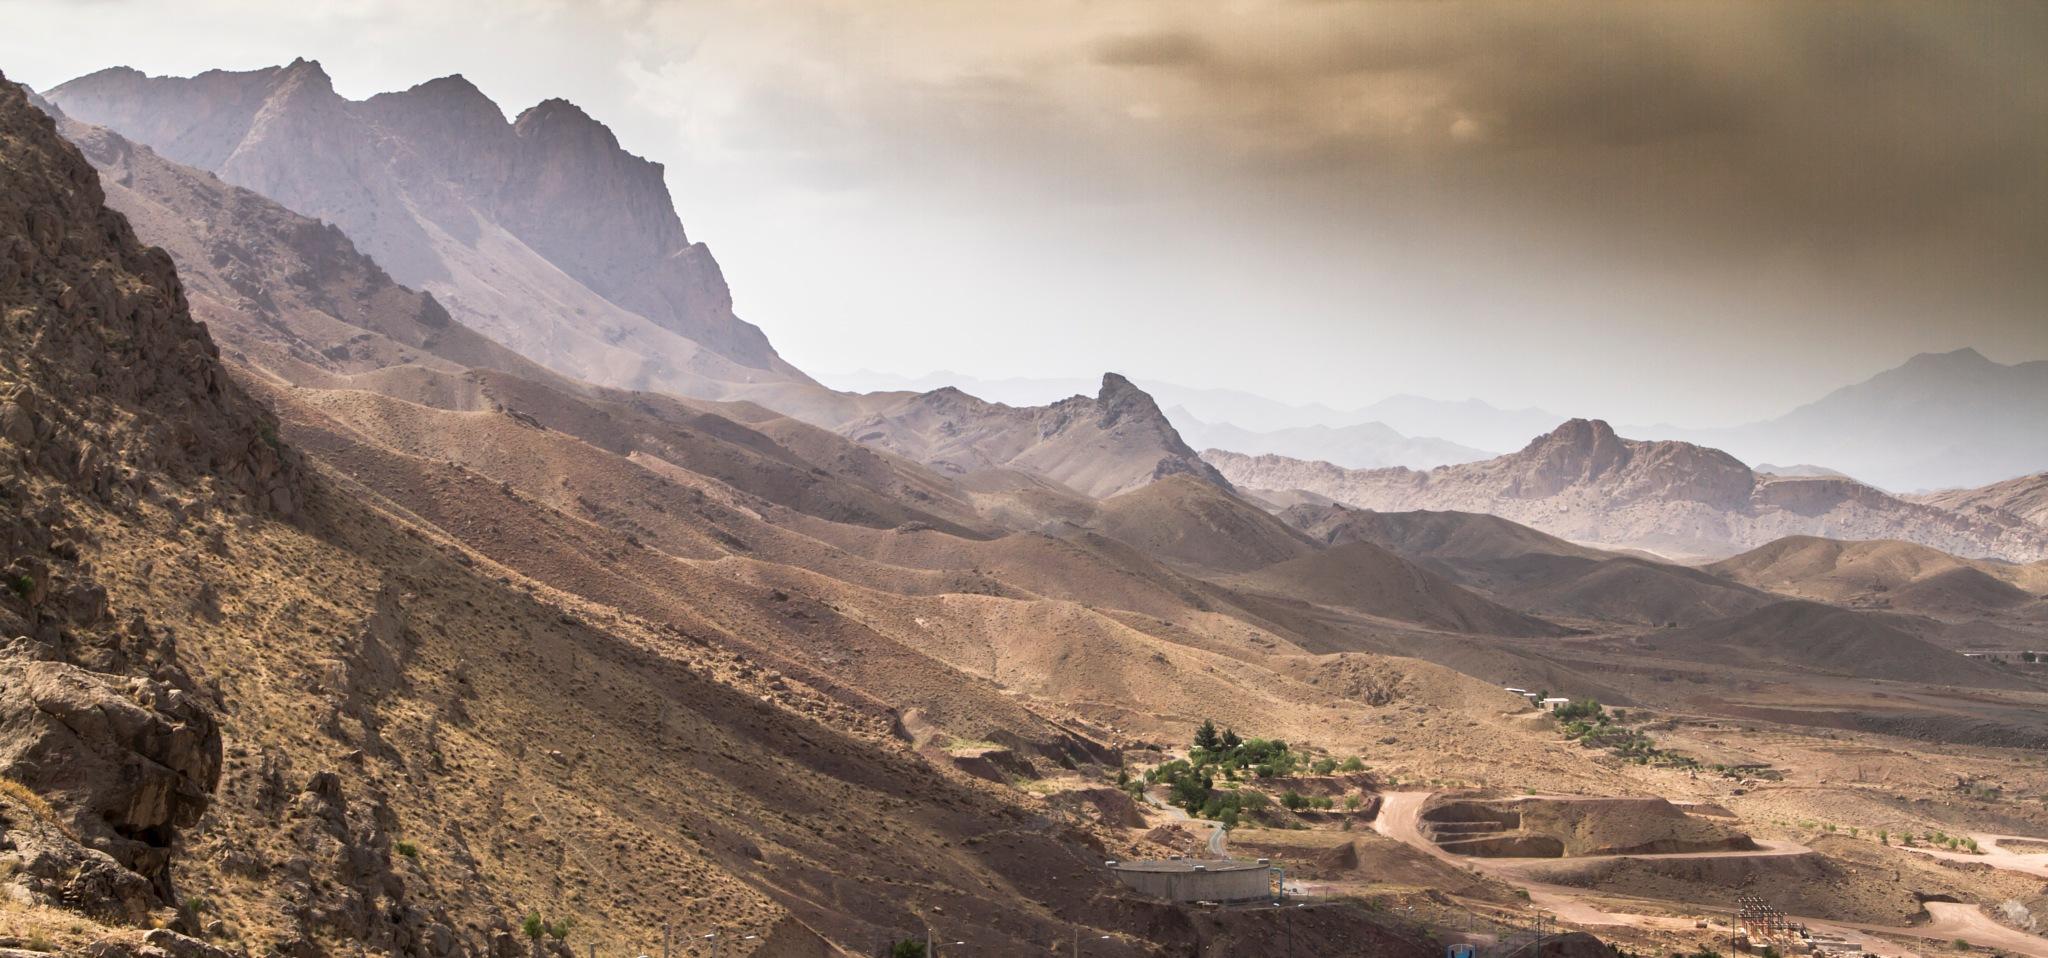 Photo in Landscape #iran #beauty #travel #landscape #nature #cloud #sky #beautiful #color #mountain